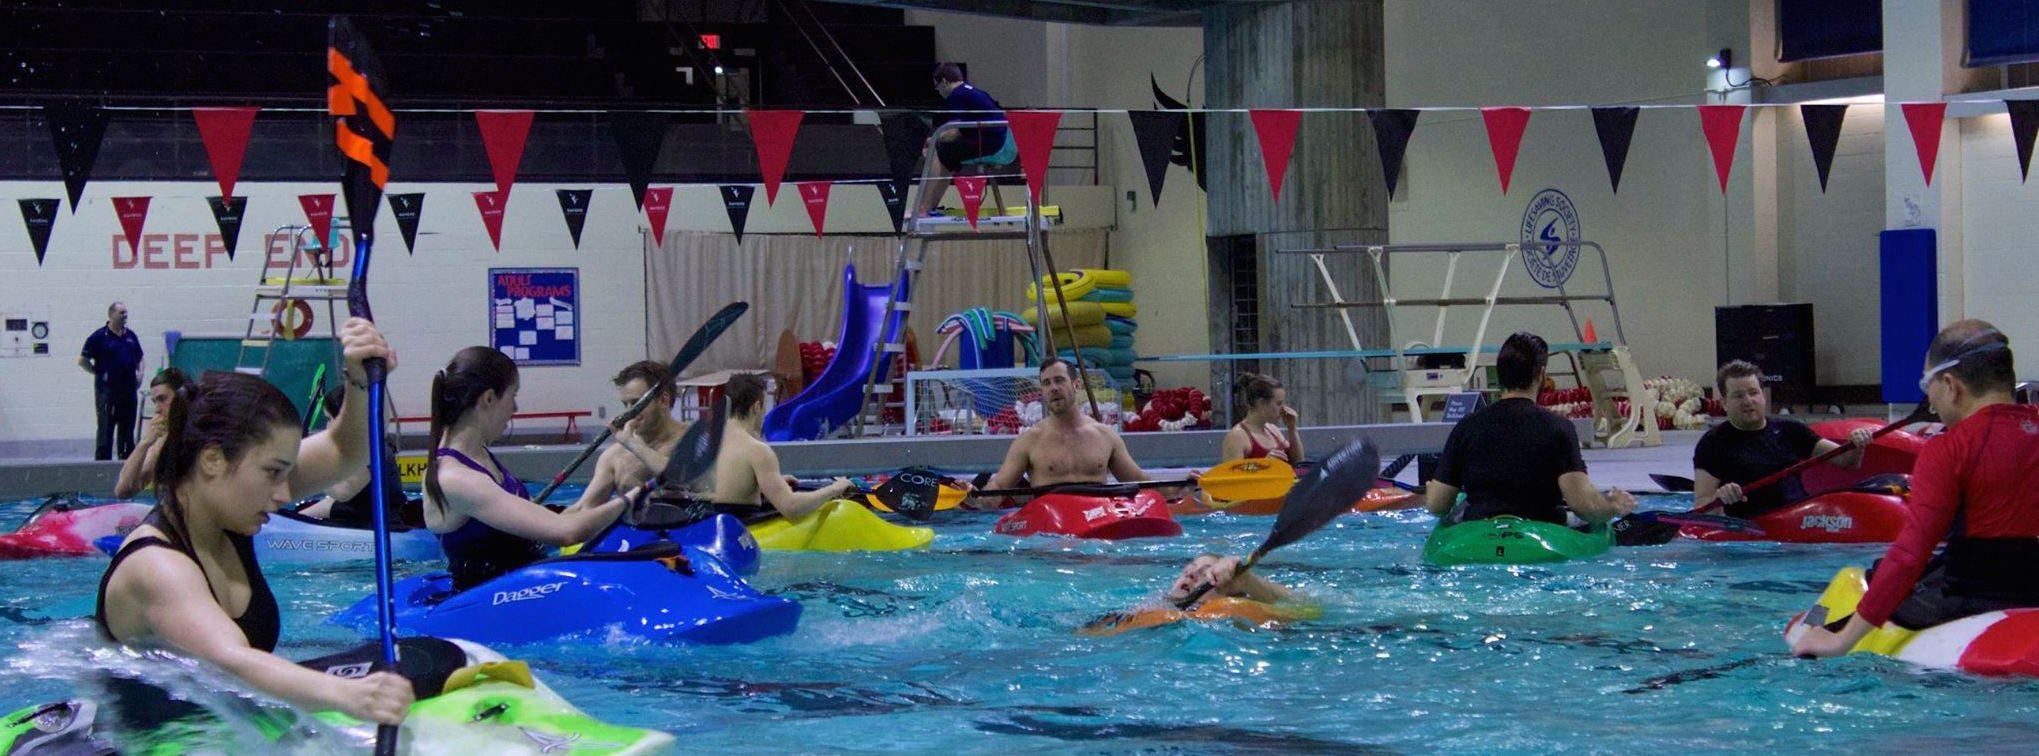 Volunteers Carleton University Kayak Club